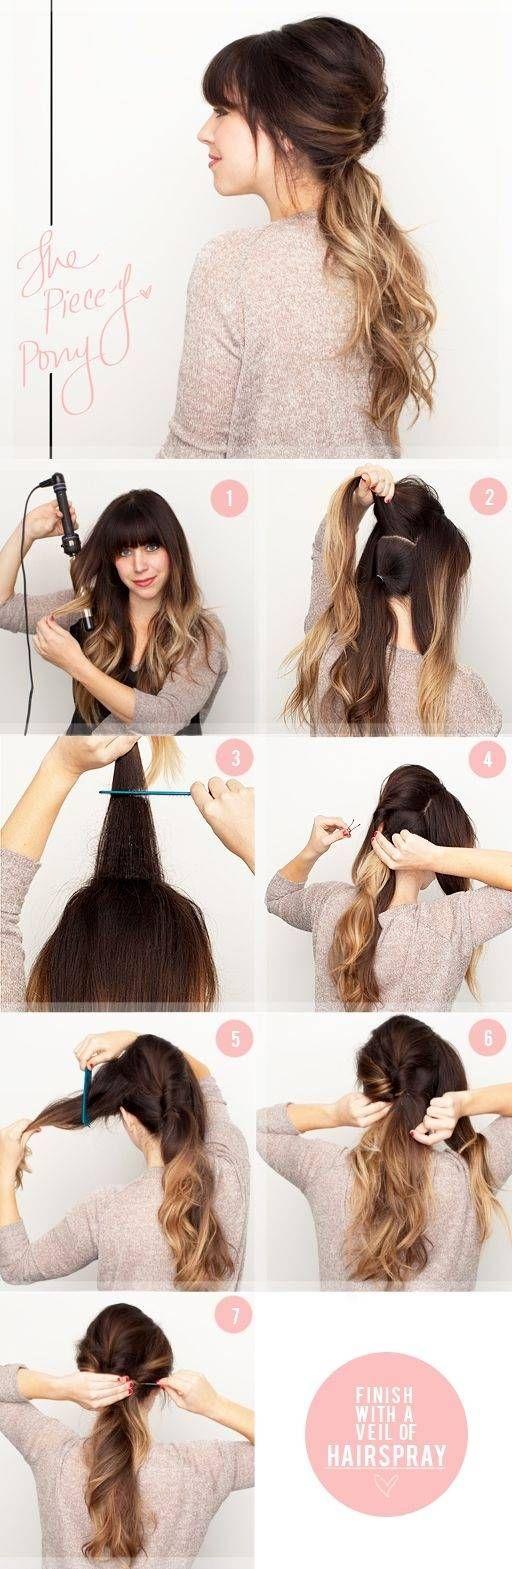 best hair images on pinterest hairstyles braids and dutch braids